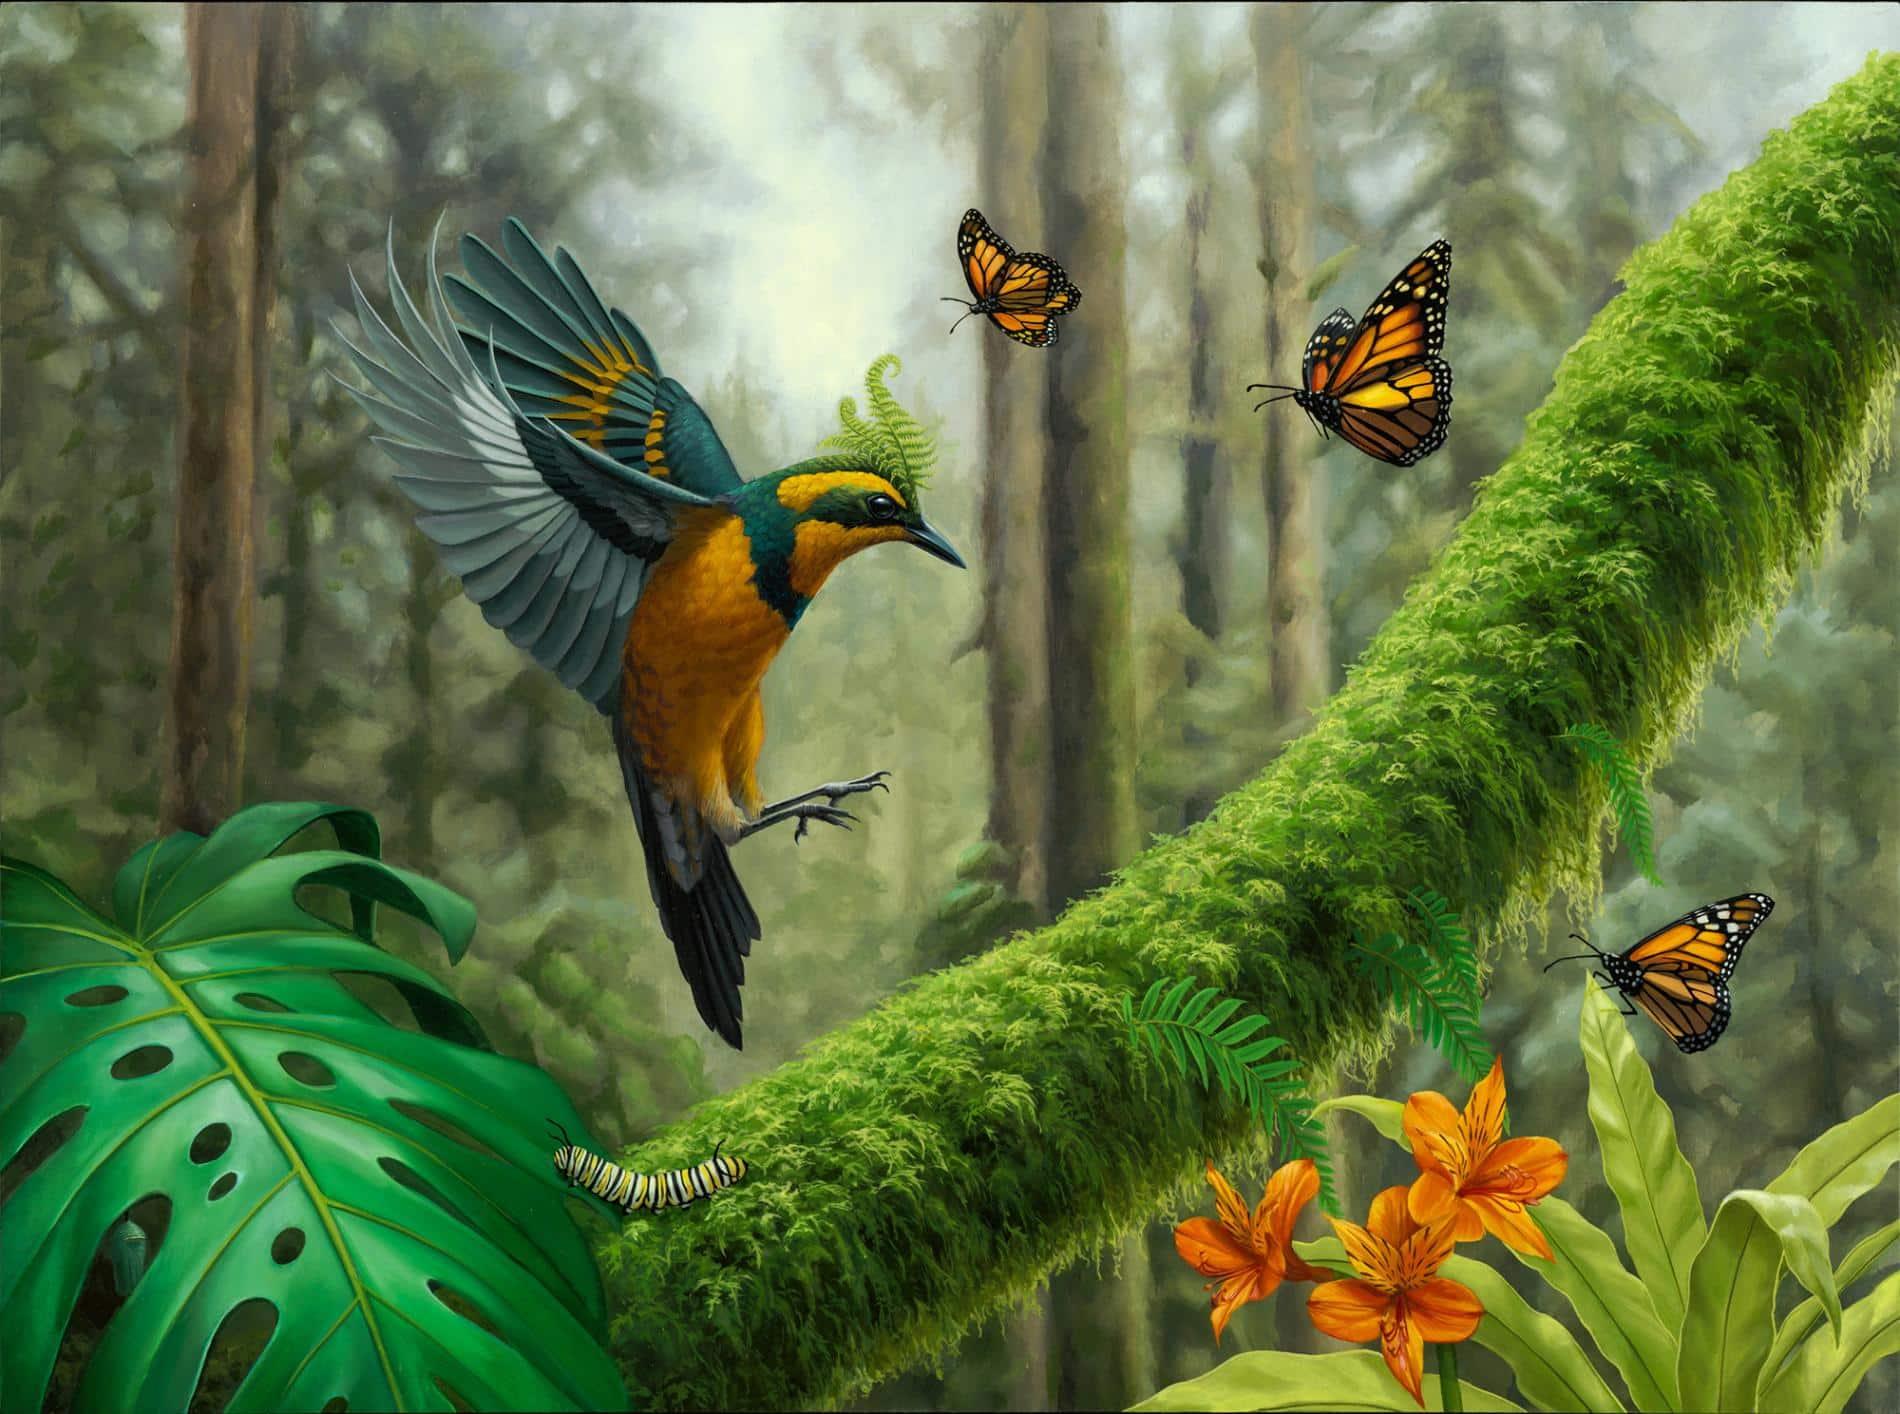 3. ching colibri